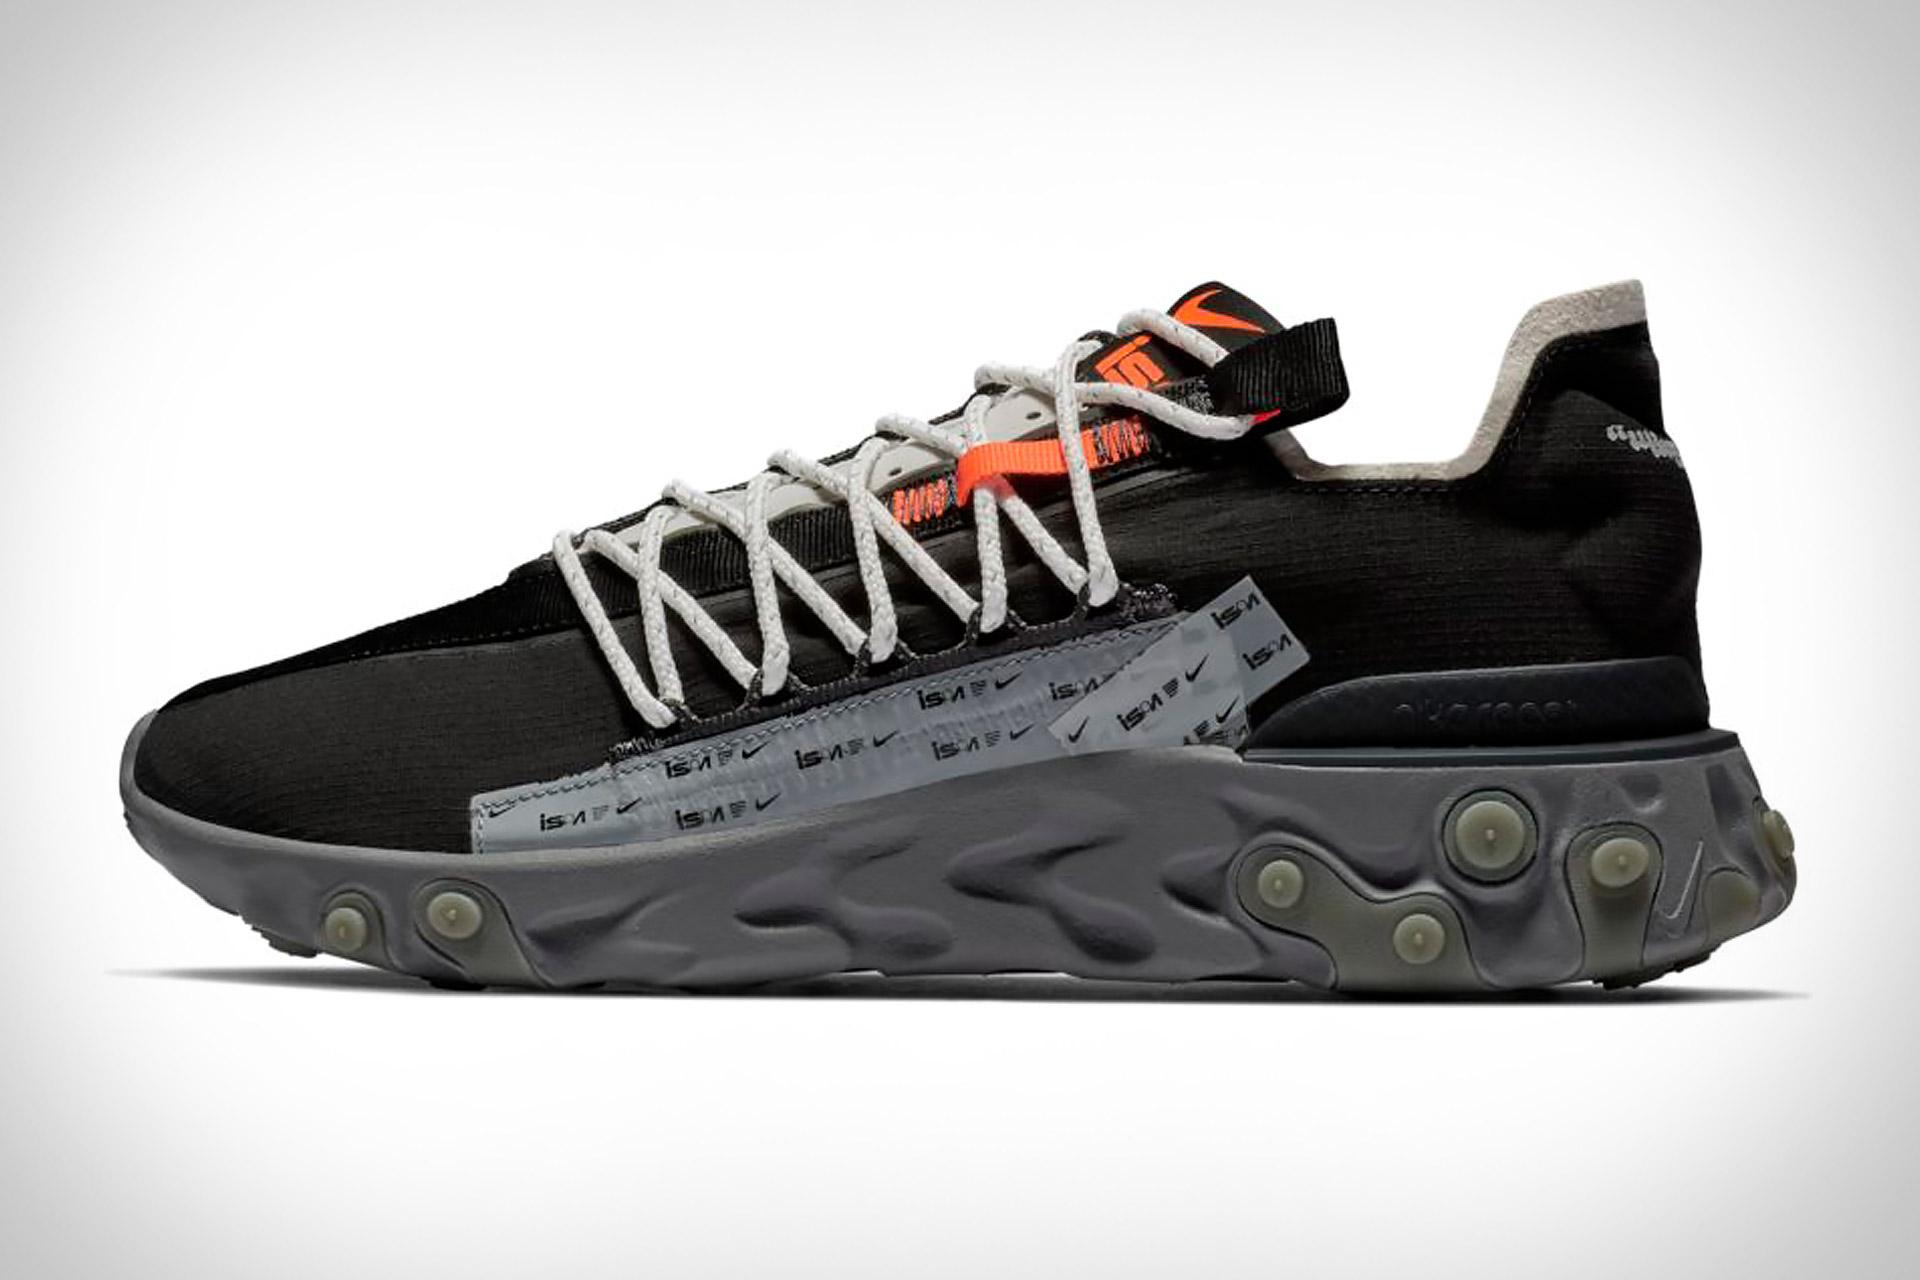 Nike ISPA React Low Sneaker